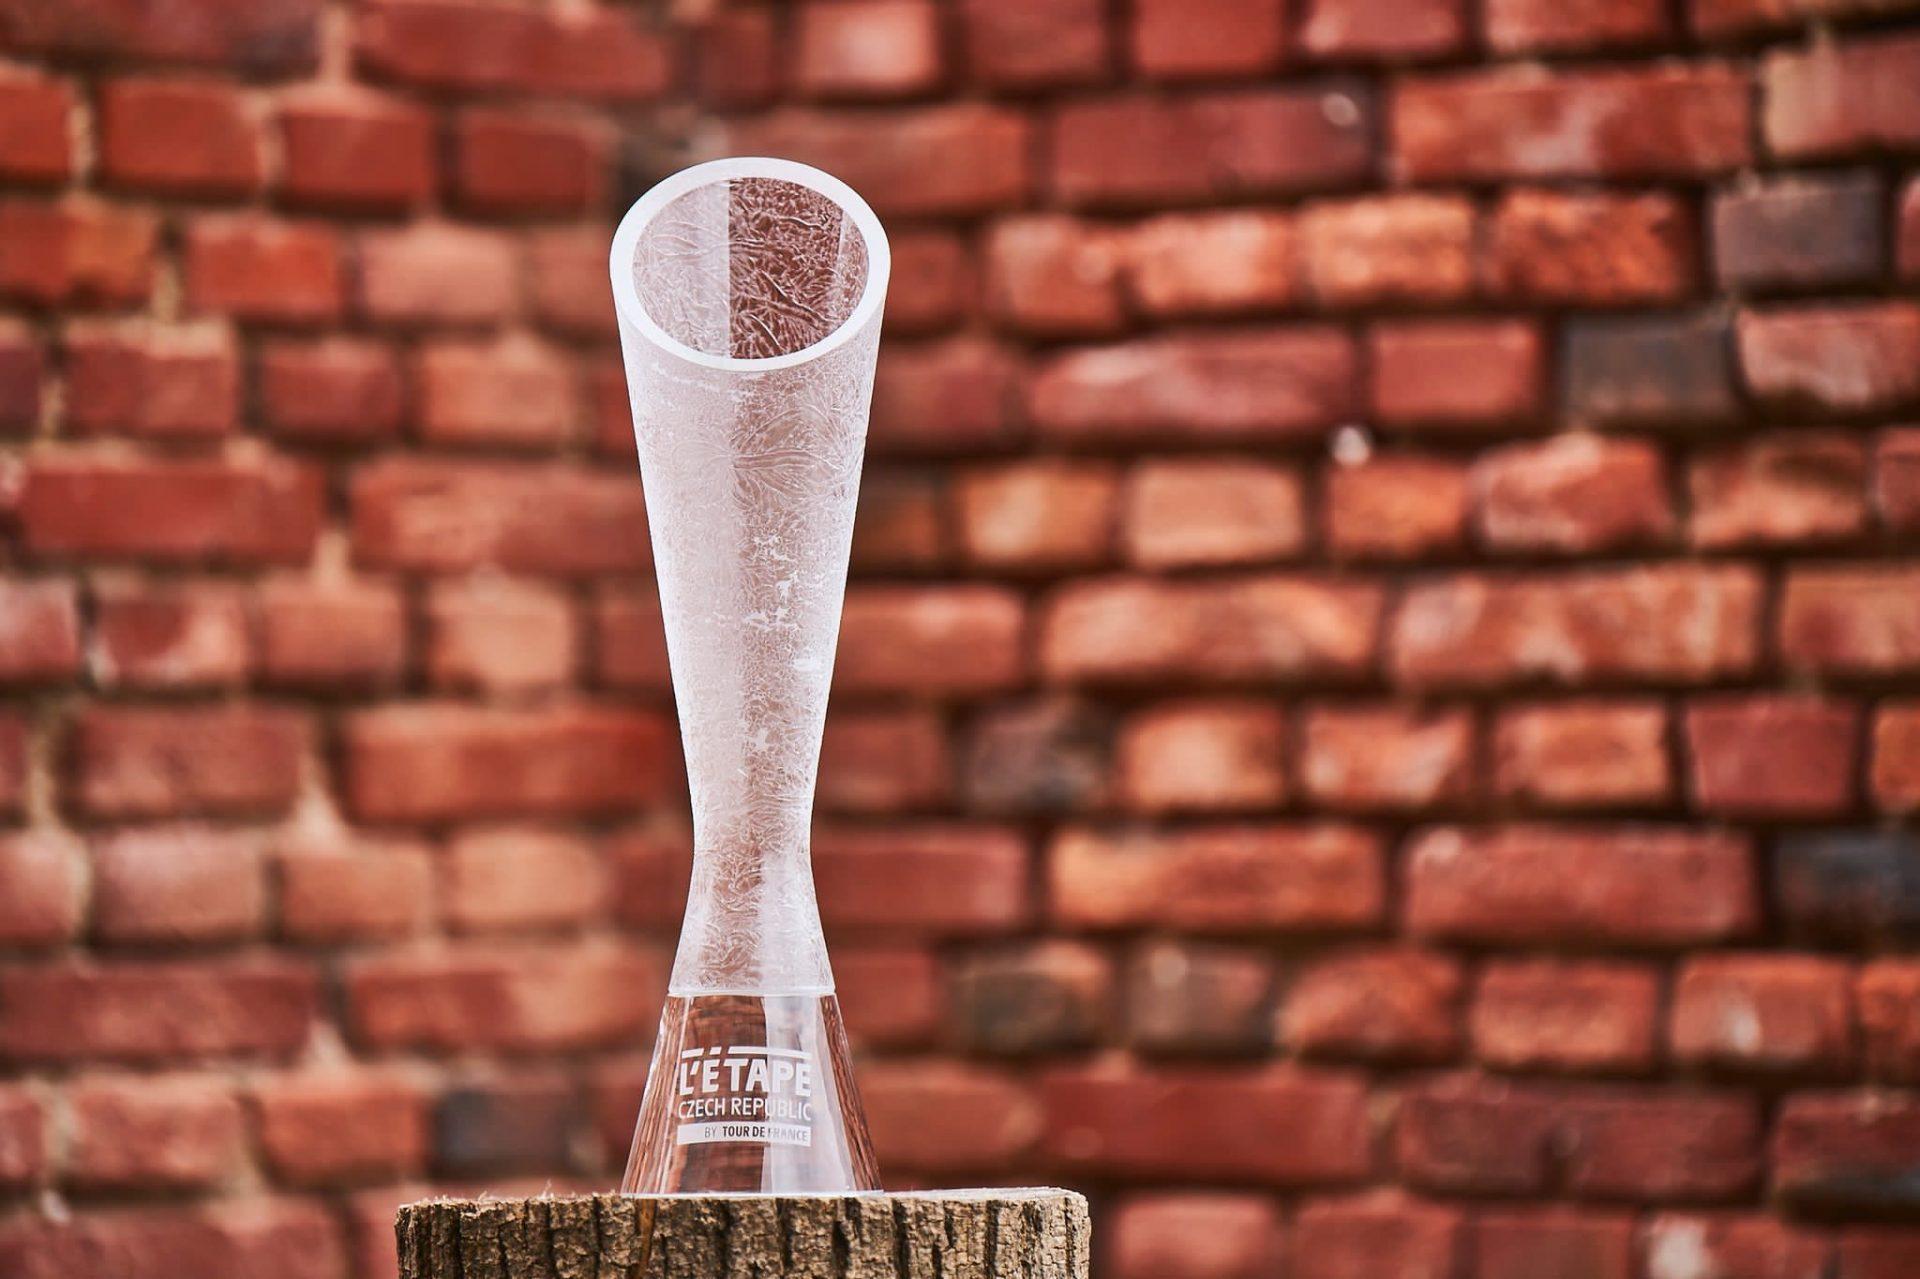 Trofej L´etape